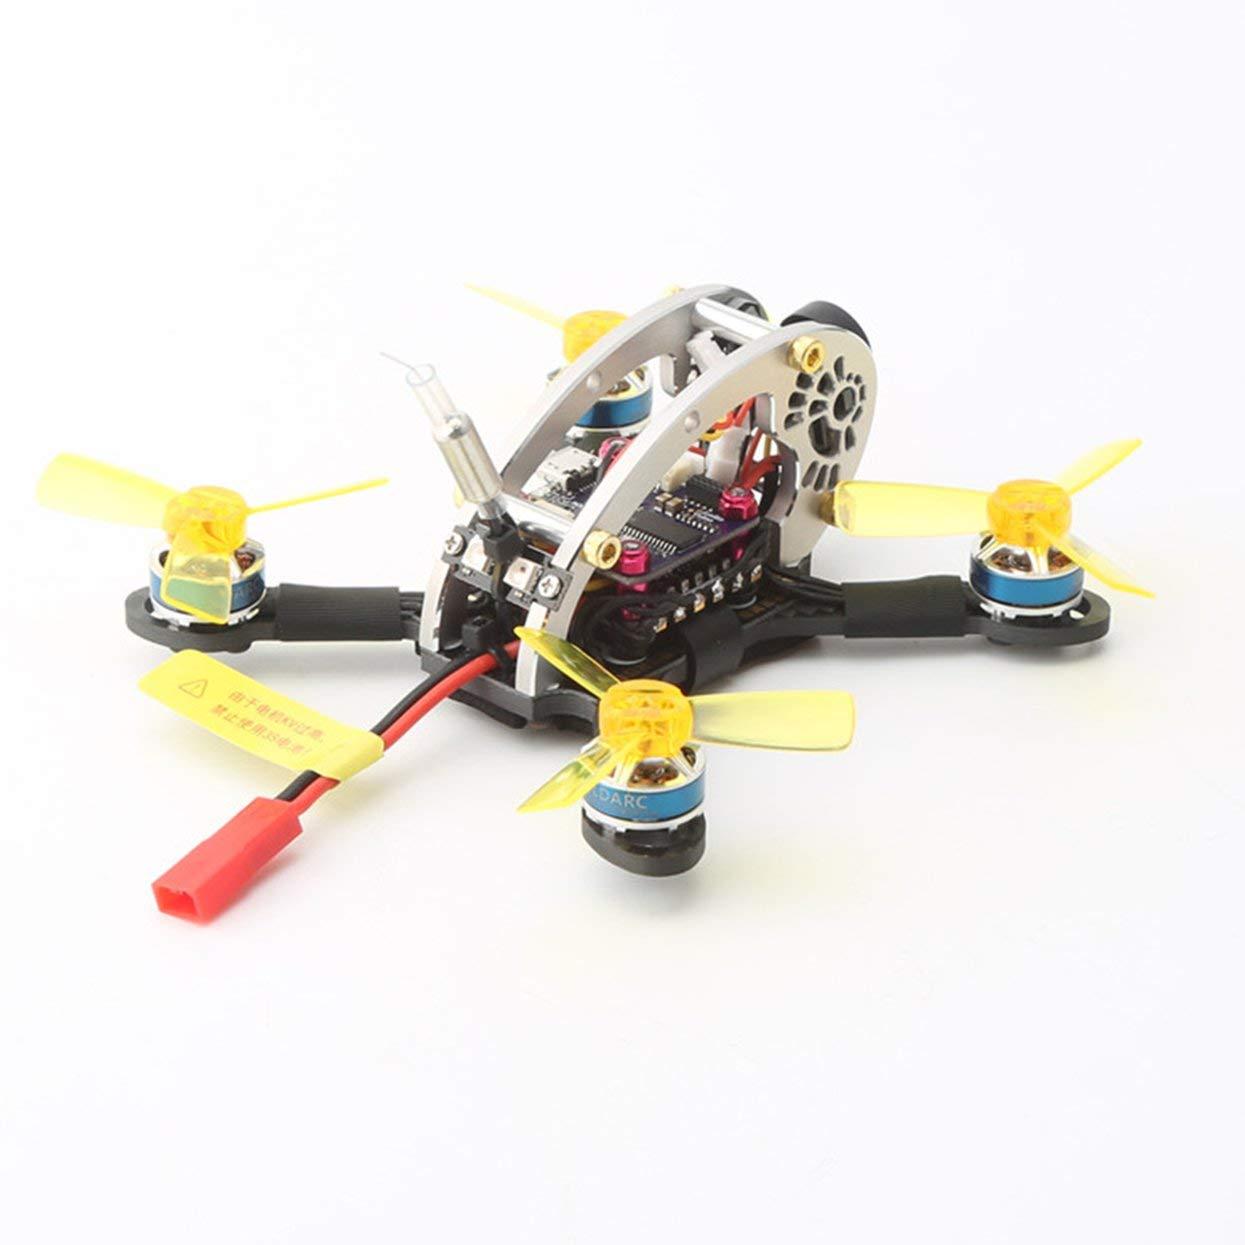 Für LDARC FPVEGG V2 5,8G Micro Mini Brushless FPV RC Racing Drone Quadcopter mit AC900 Empfänger VTX Kamera OSD PNP Version